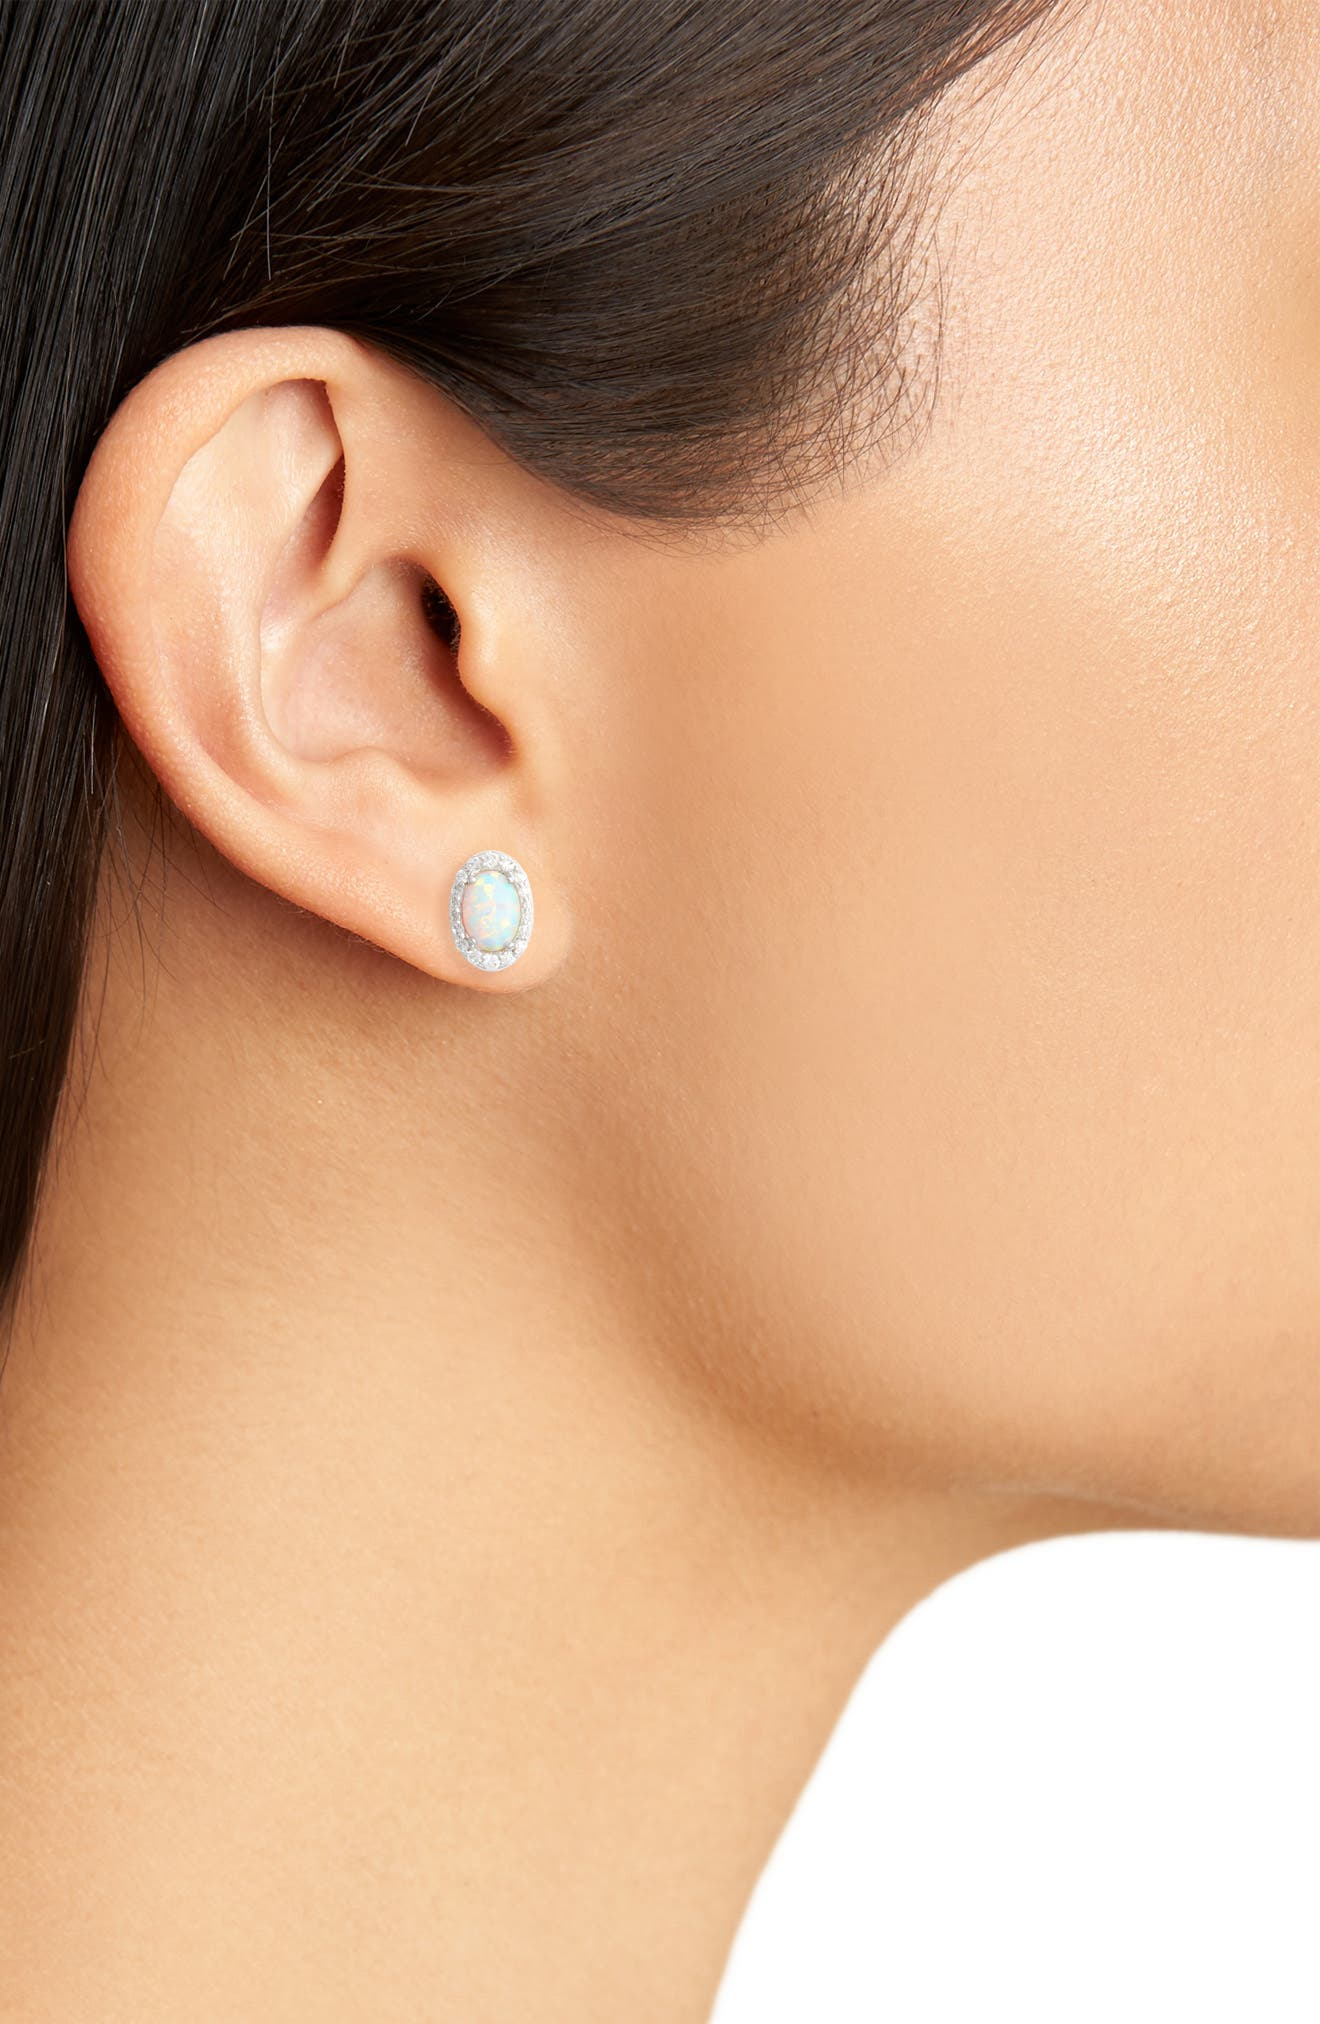 Simulated Opal Halo Stud Earrings,                             Alternate thumbnail 2, color,                             100